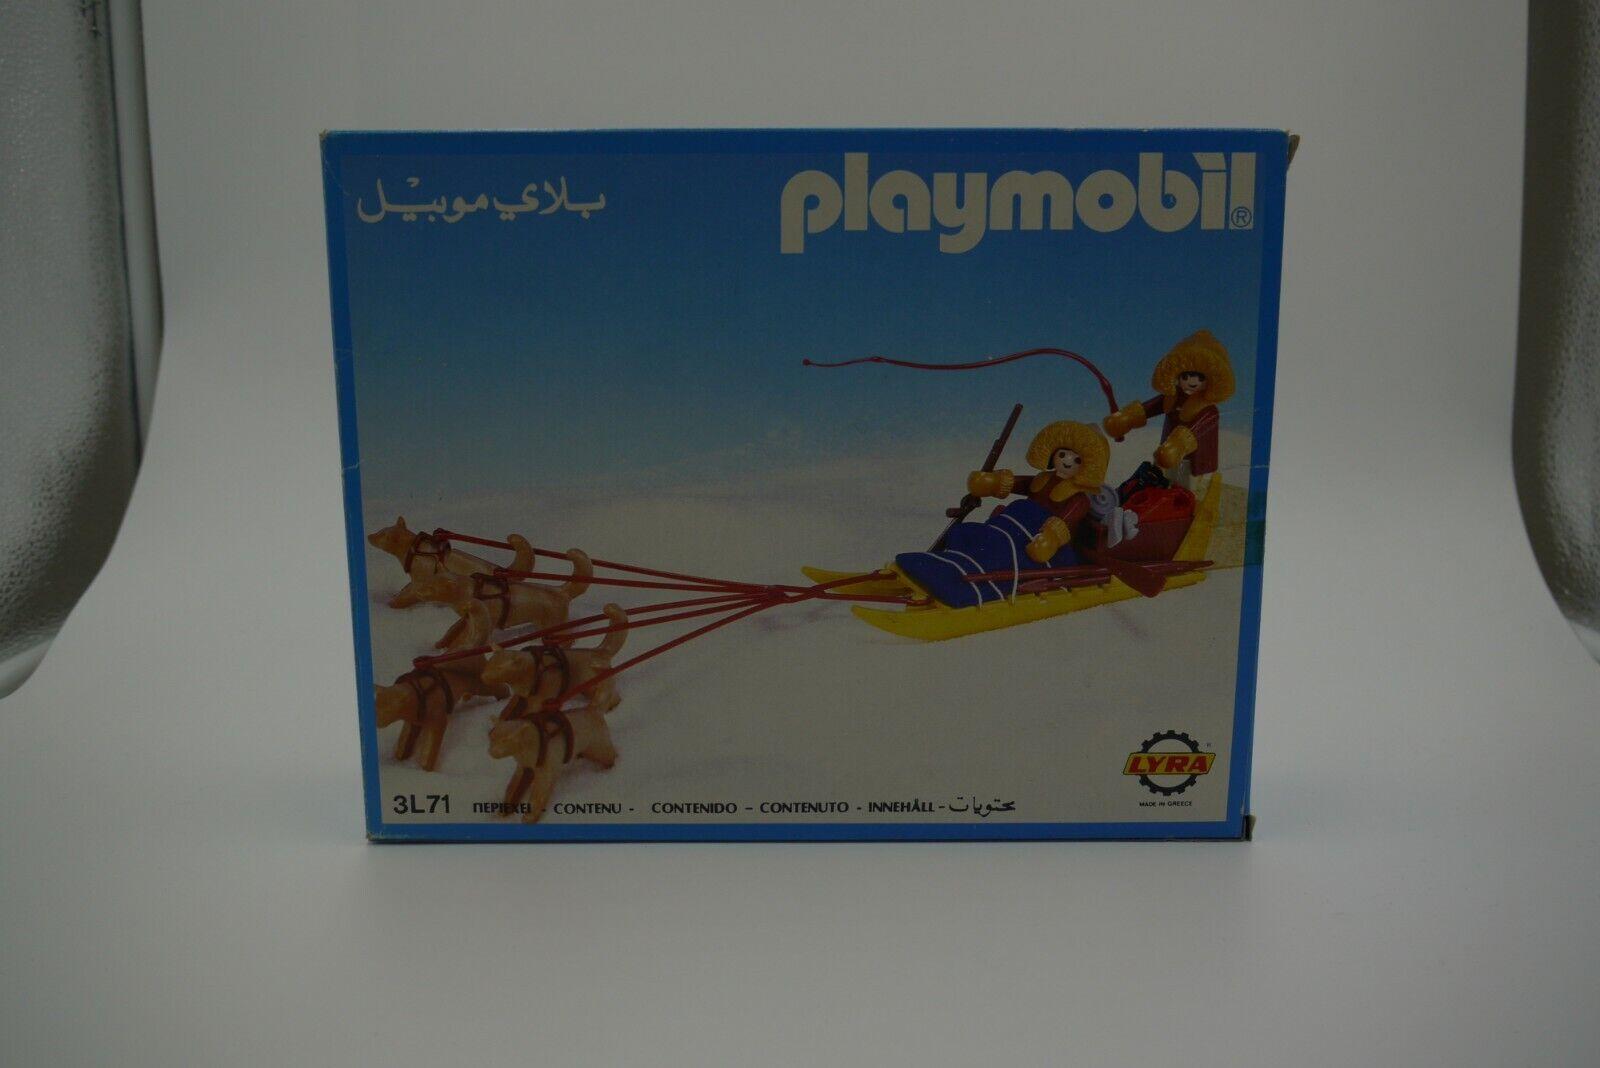 Playmobil 3L71 grec Lyra Eskimo traîneau Set Figure En parfait état, dans sa boîte